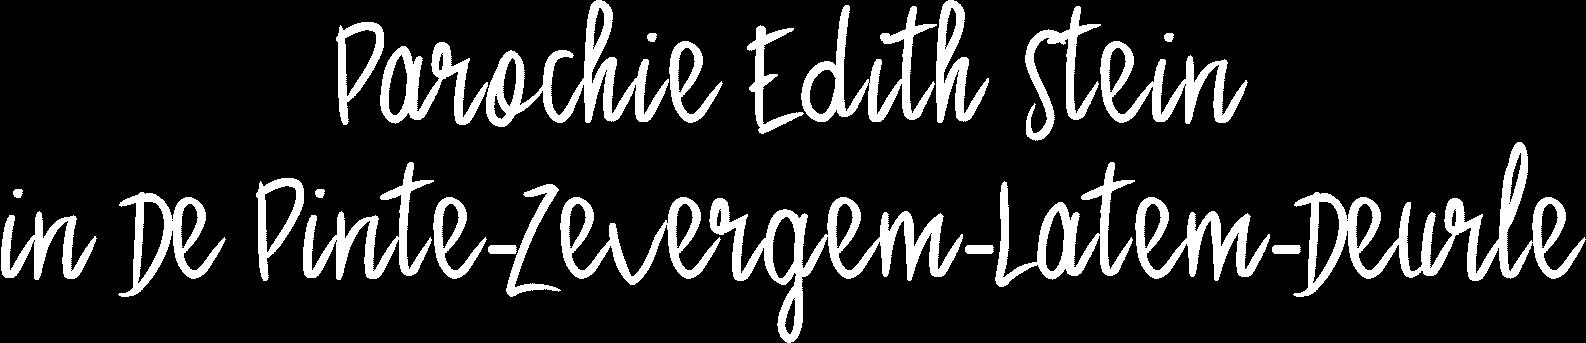 Parochie De Pinte-Zevergem-Latem-Deurle logo